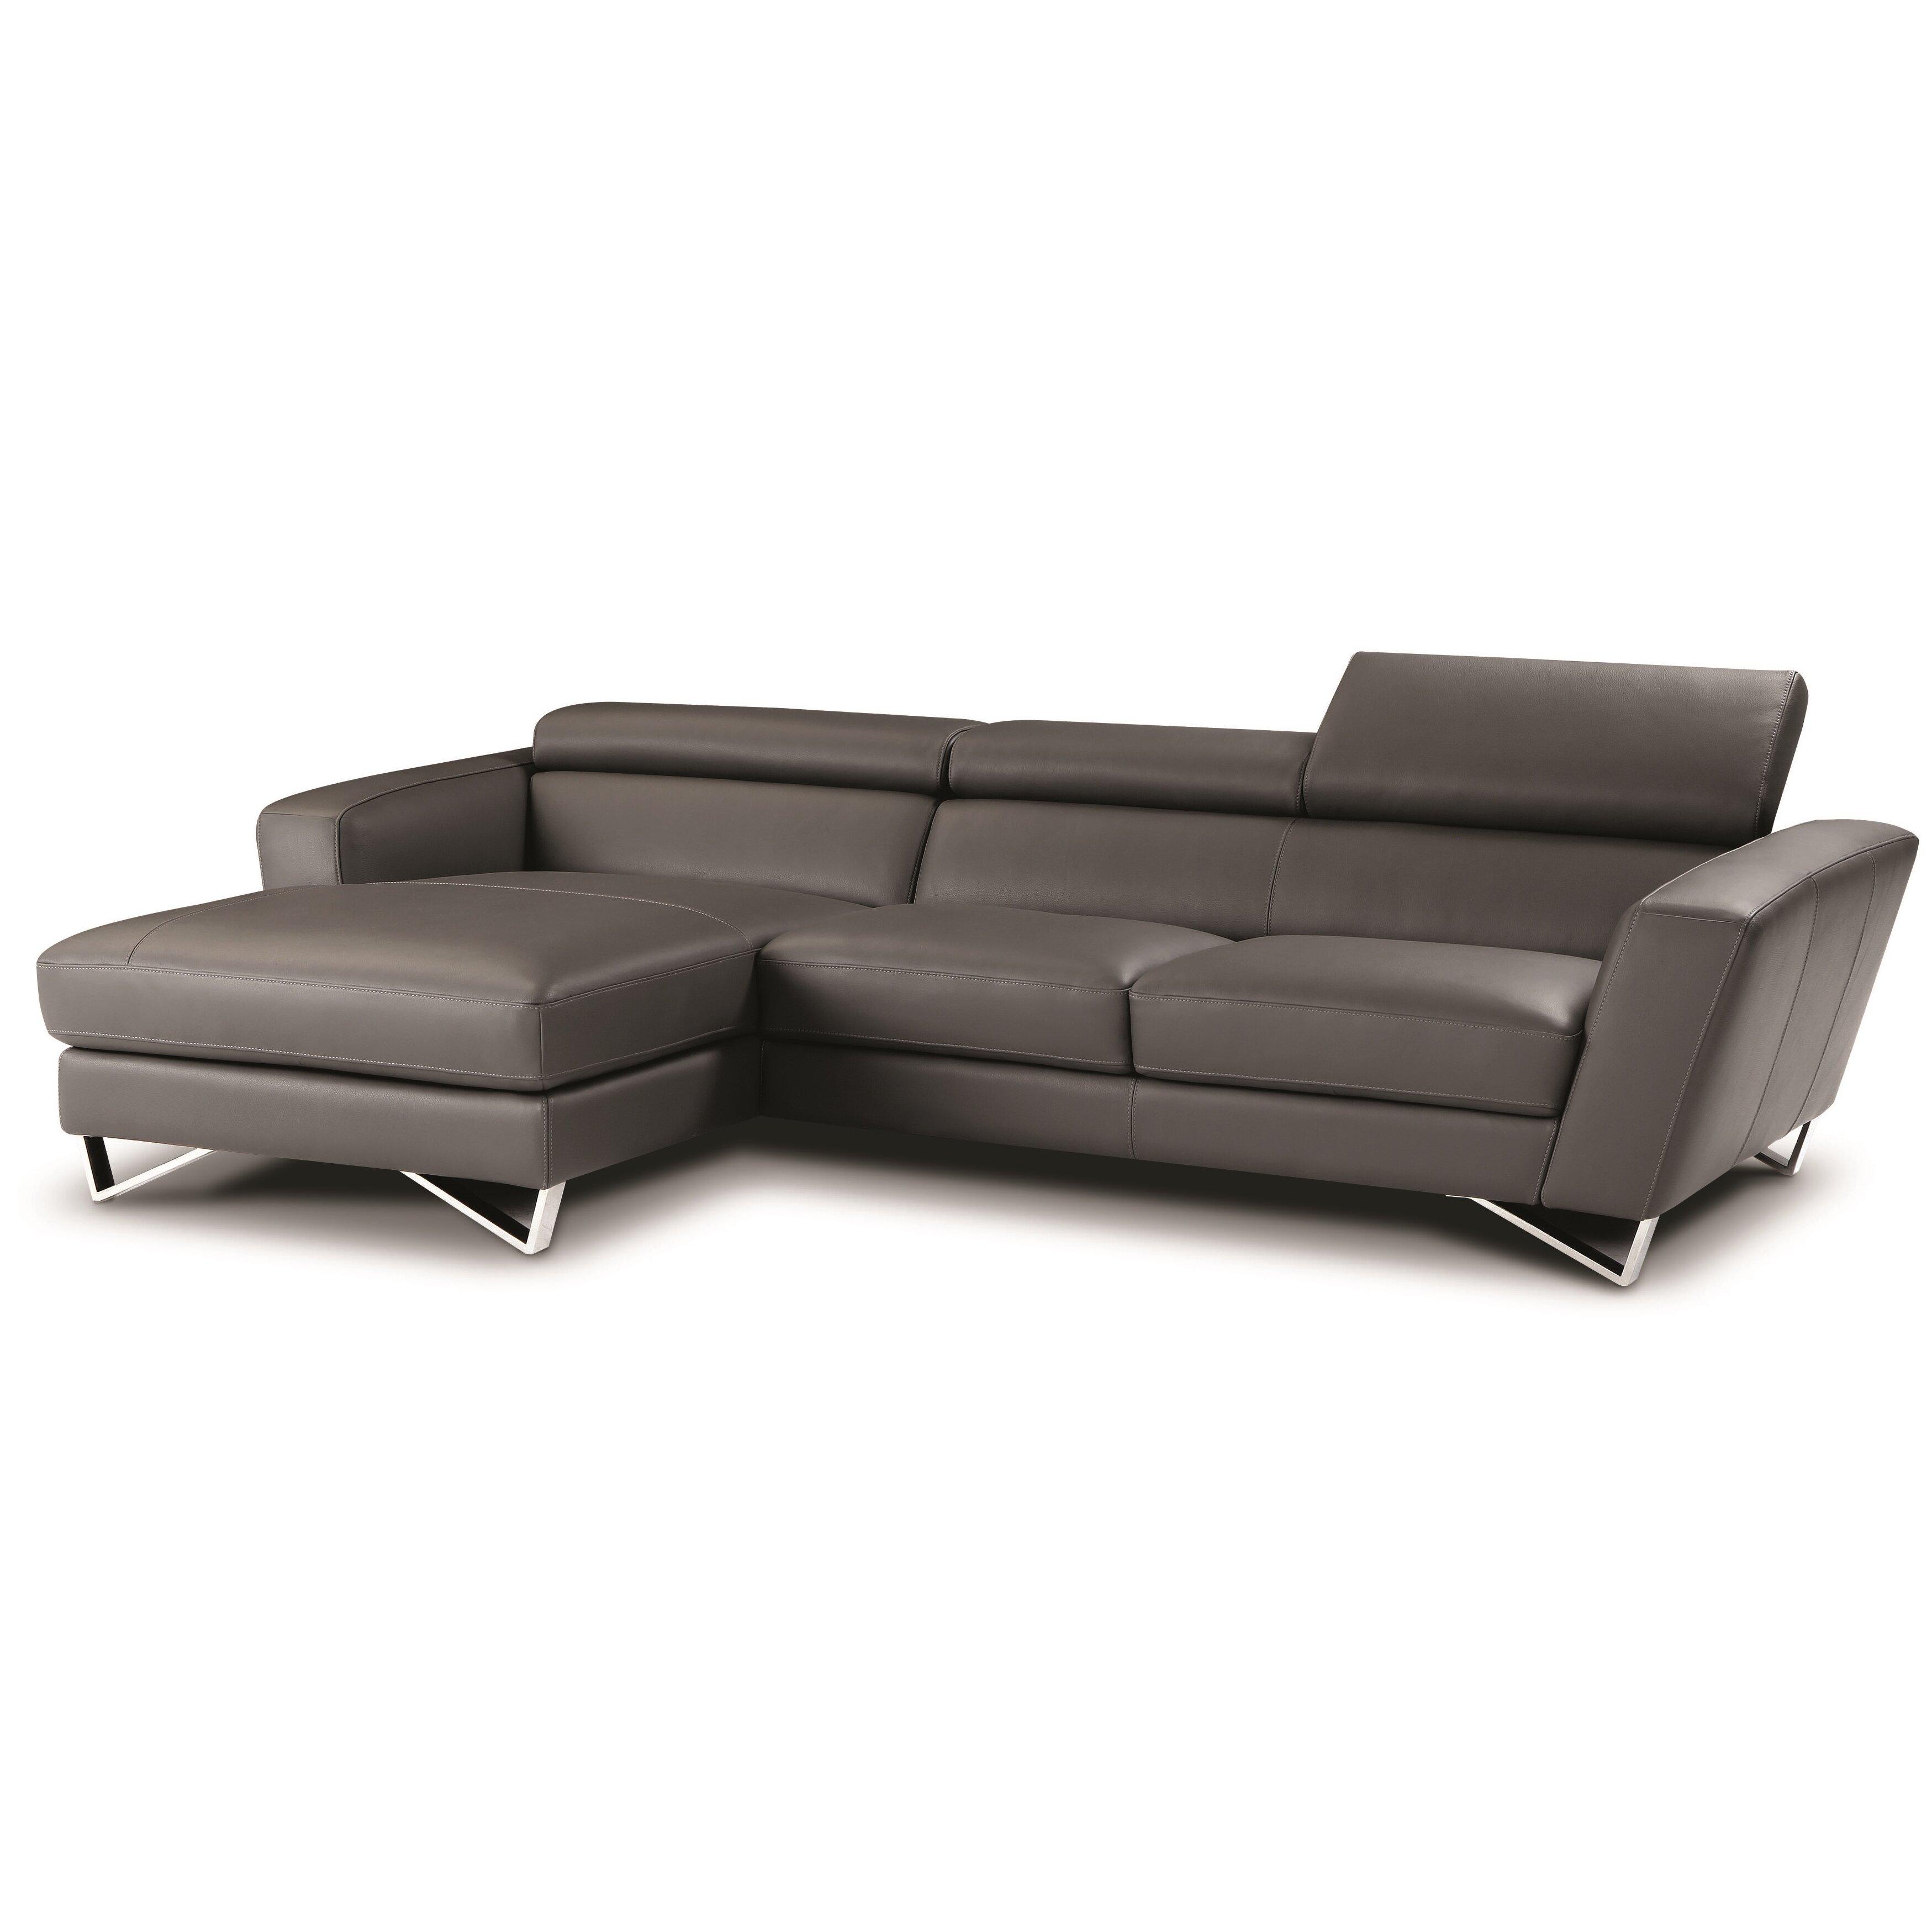 j m furniture sparta sectional reviews wayfair